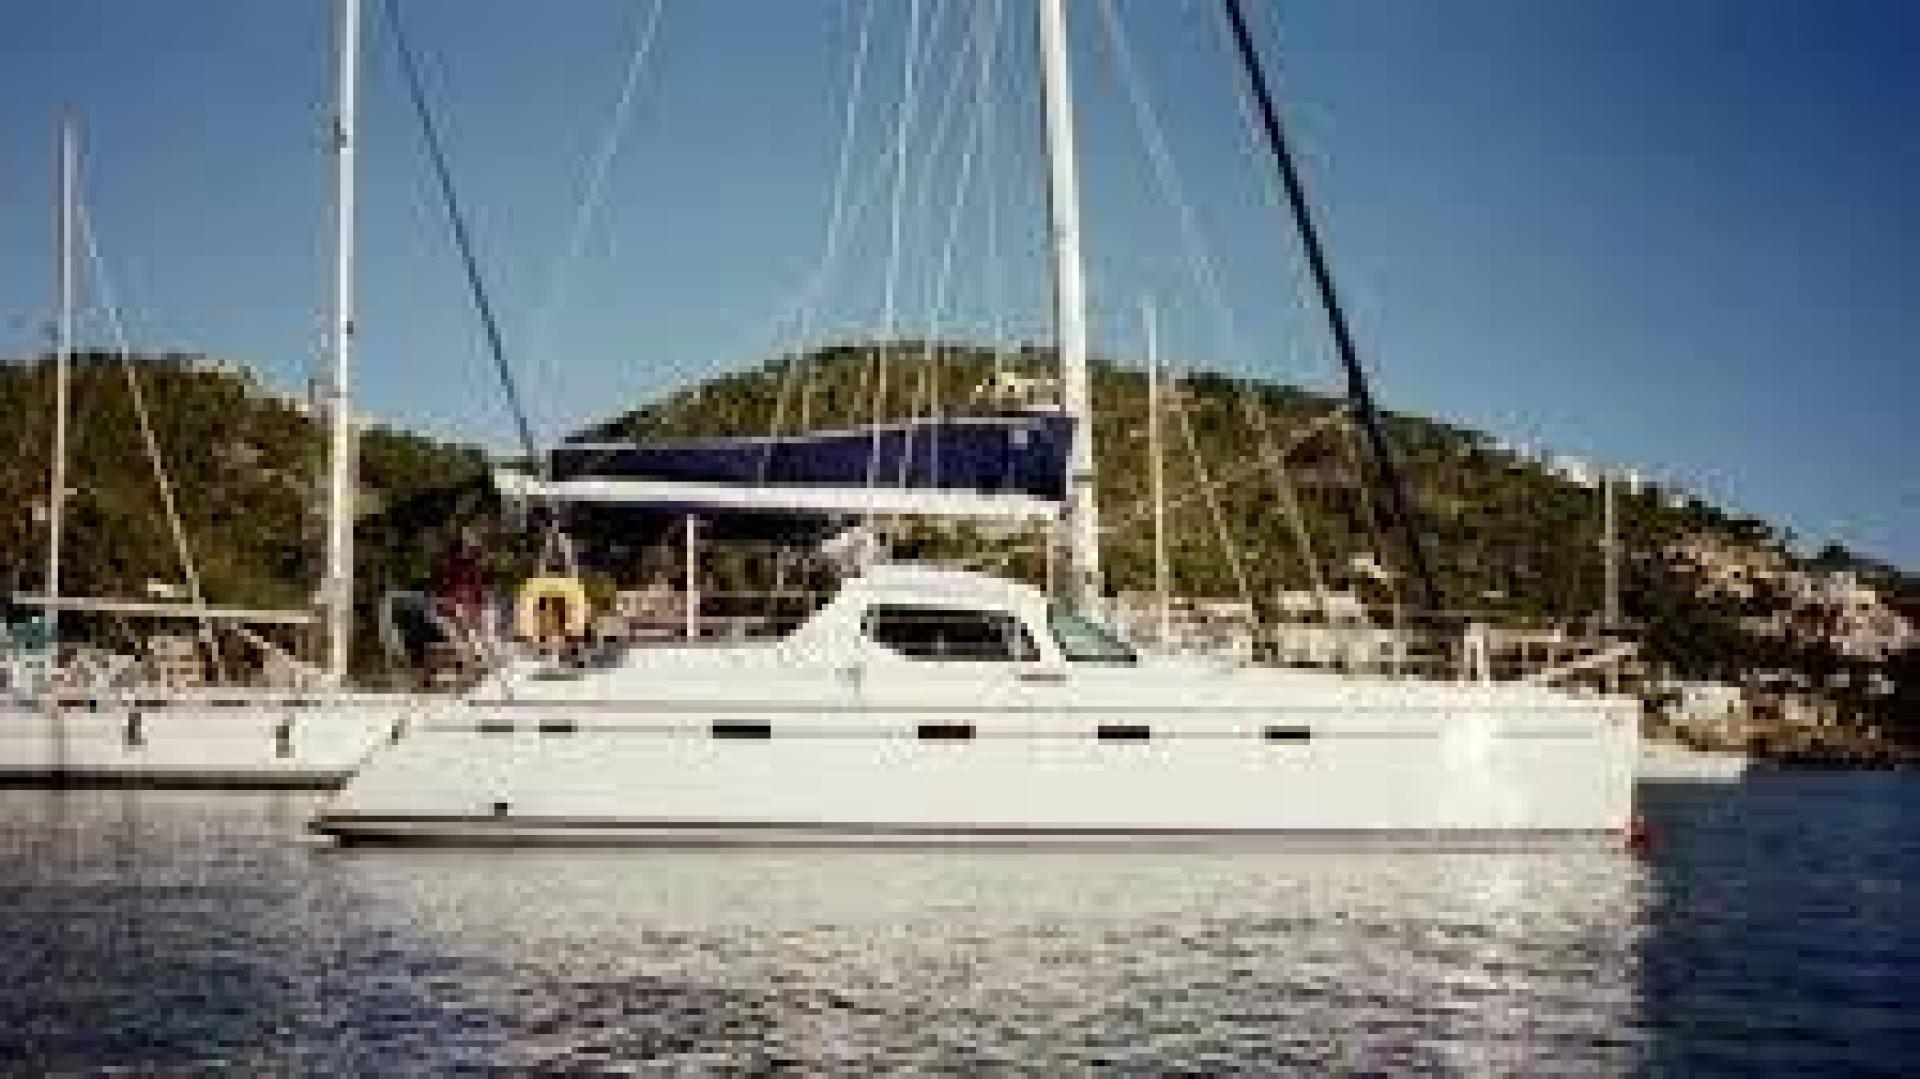 Picture Of: 43' Privilege Privilege 435 2001 Yacht For Sale | 1 of 12